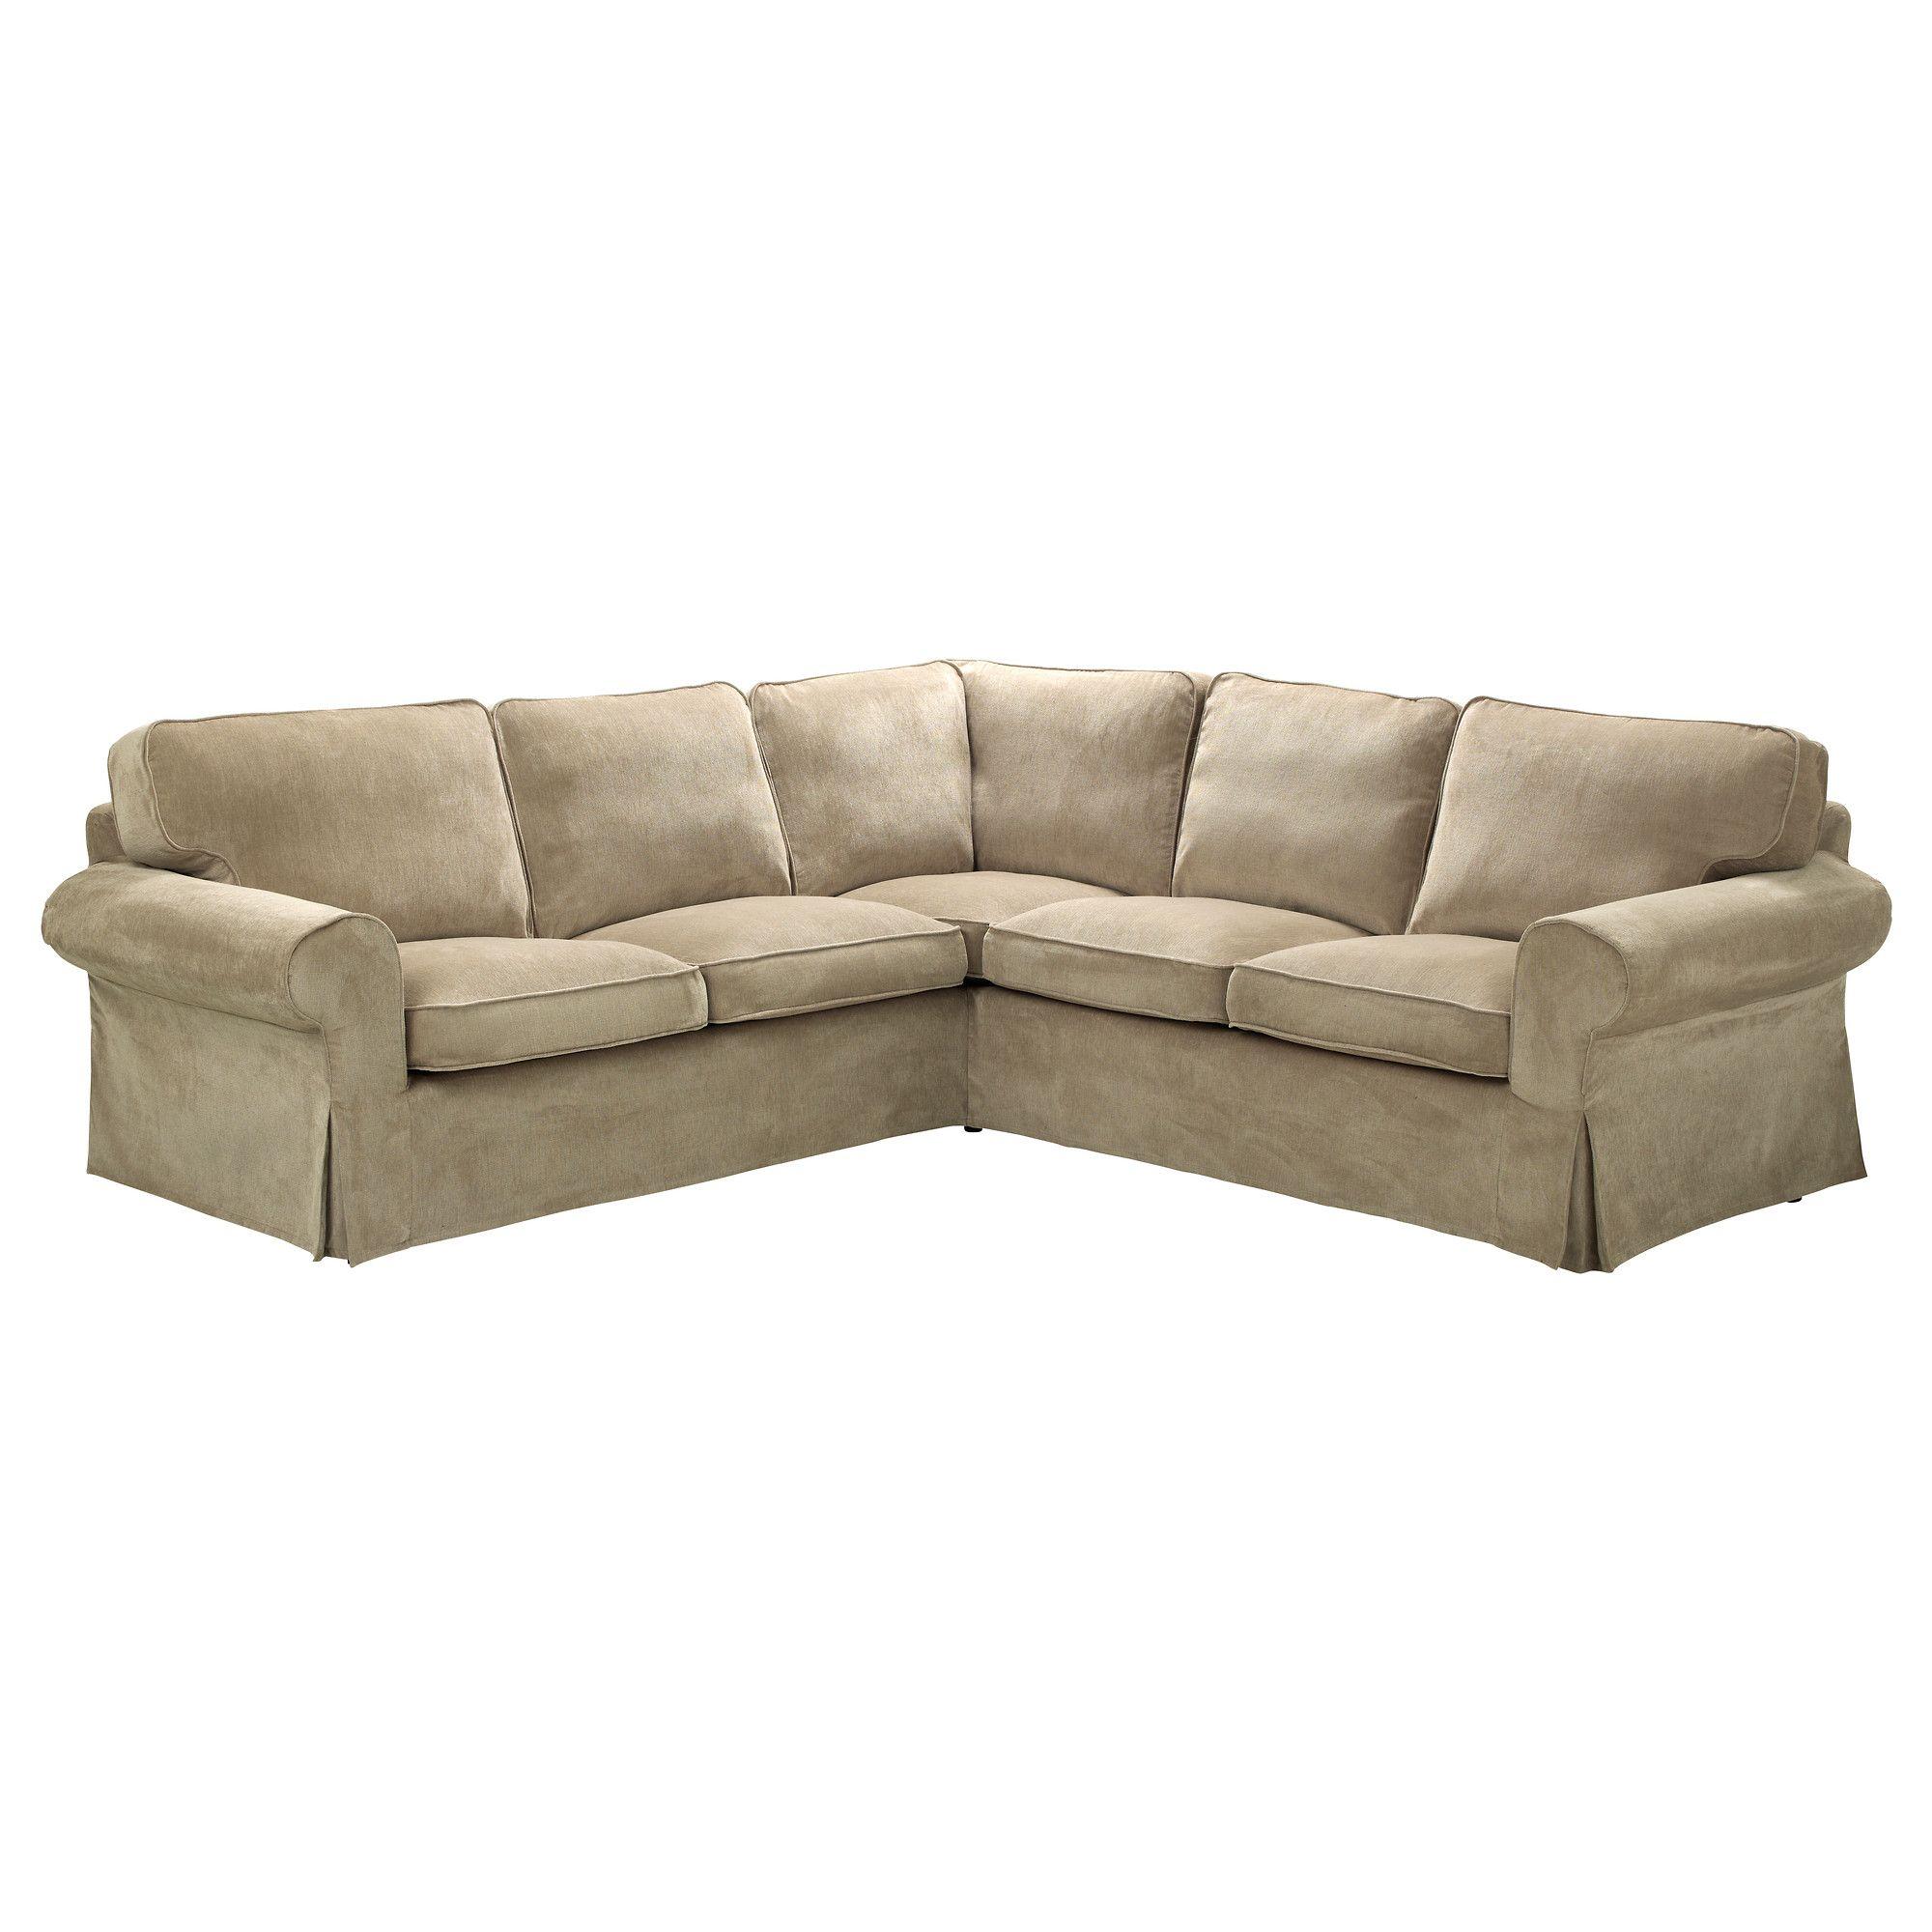 Shop For Furniture Home Accessories More Corner Sofa Modern Ikea Ektorp Sofa Corner Sofa